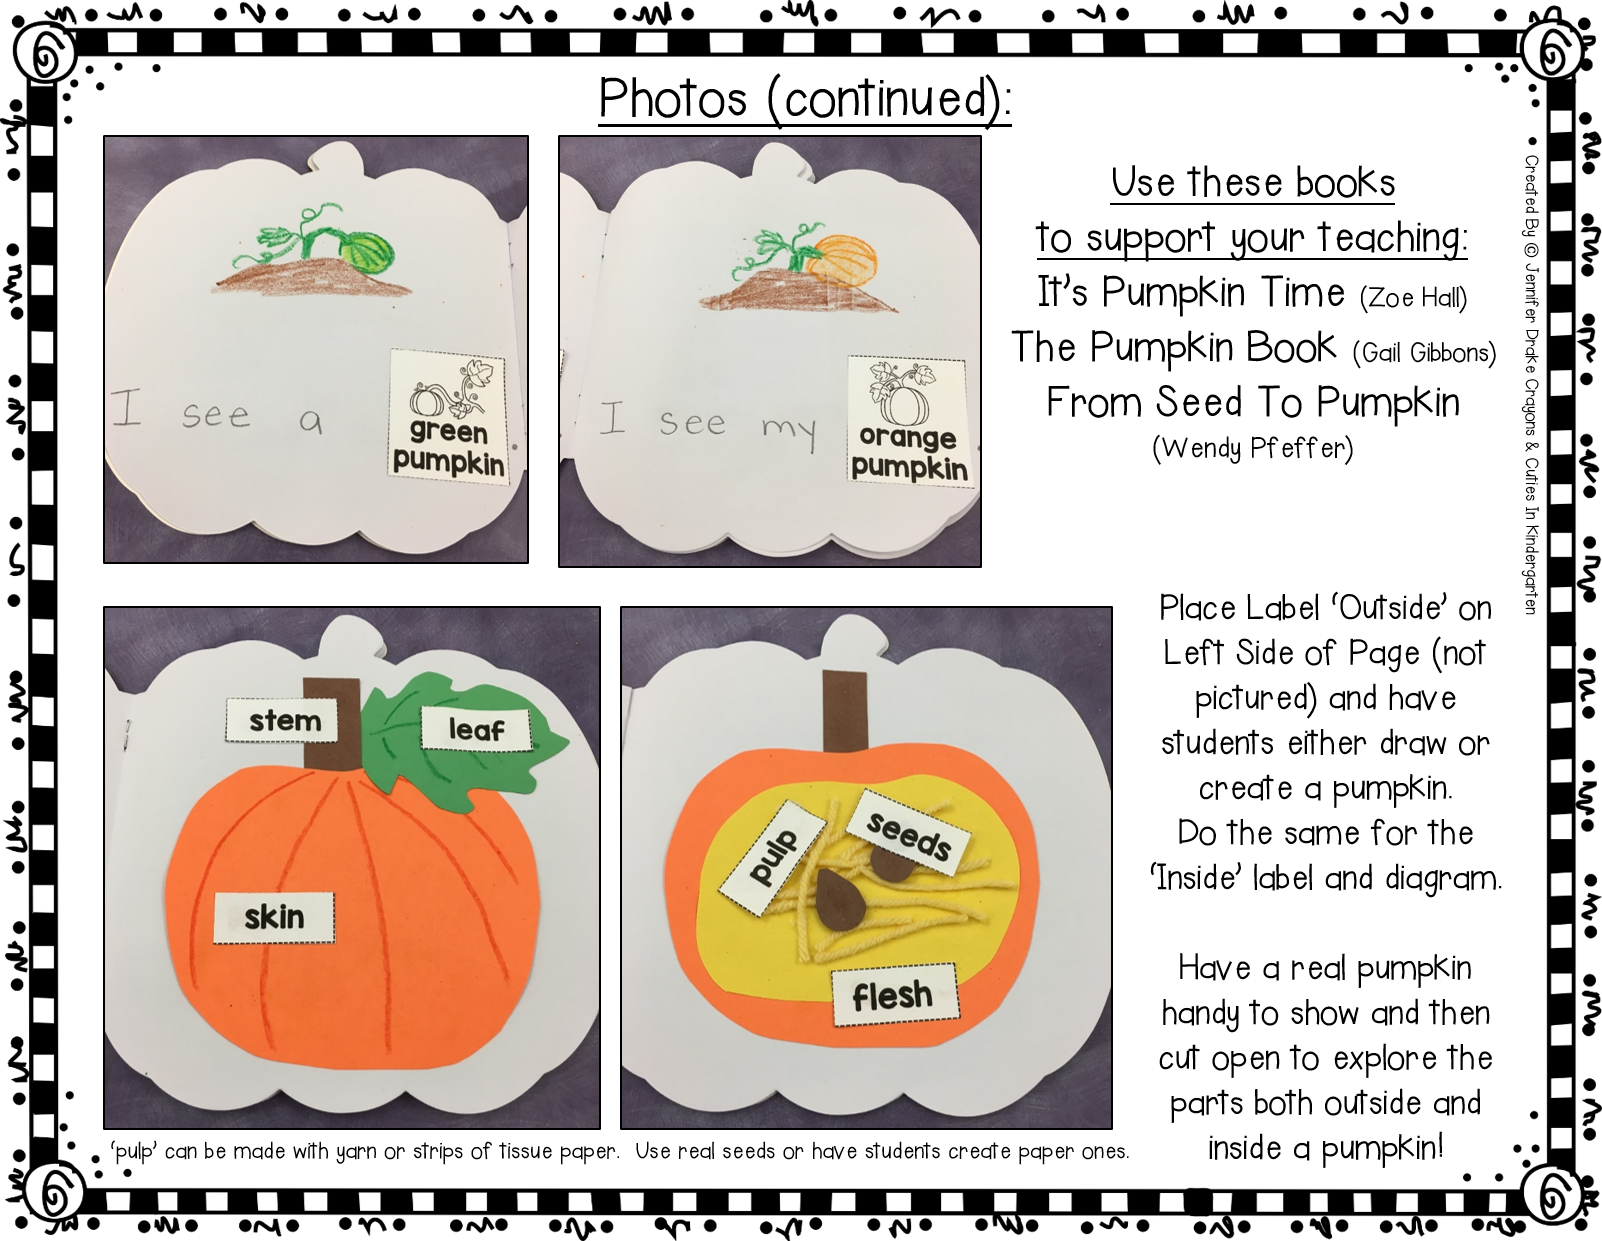 pumpkin shape book science shape books spot books pumpkin also created a diagram of a pumpkin with labels to show the inside [ 1602 x 1241 Pixel ]